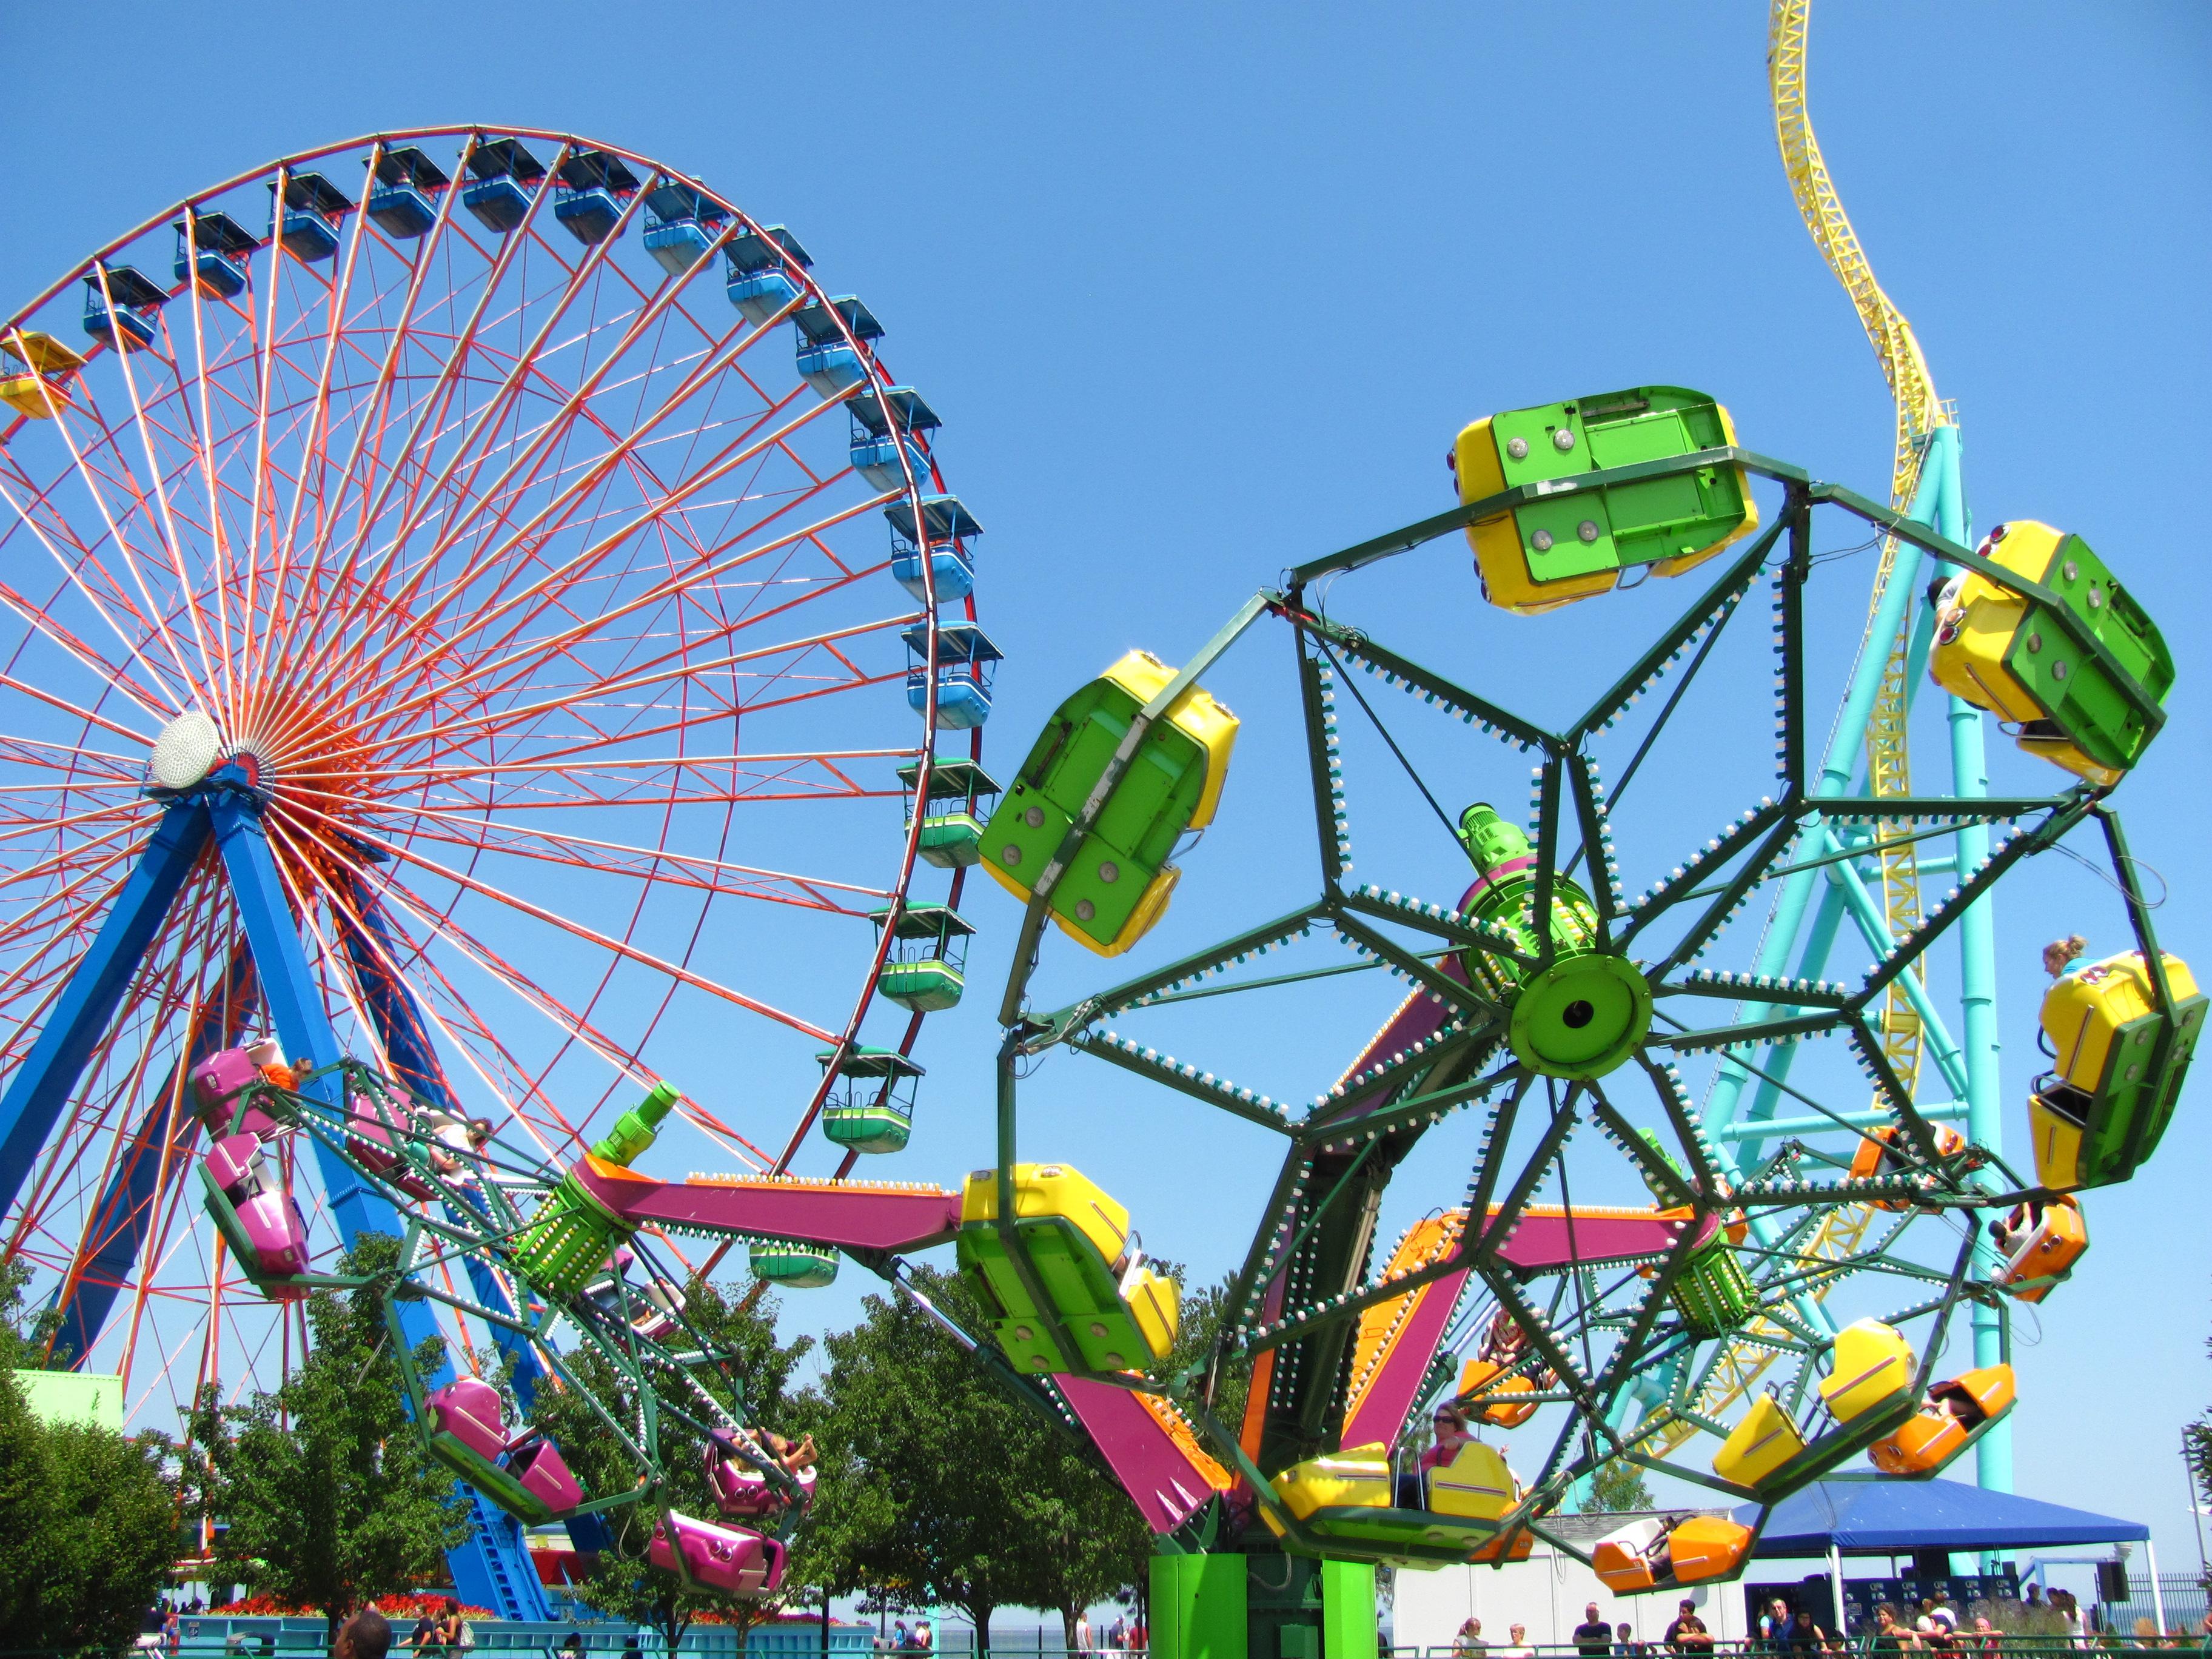 File:Cedar Point amusement rides 090 (9550420996).jpg - Wikimedia Commons